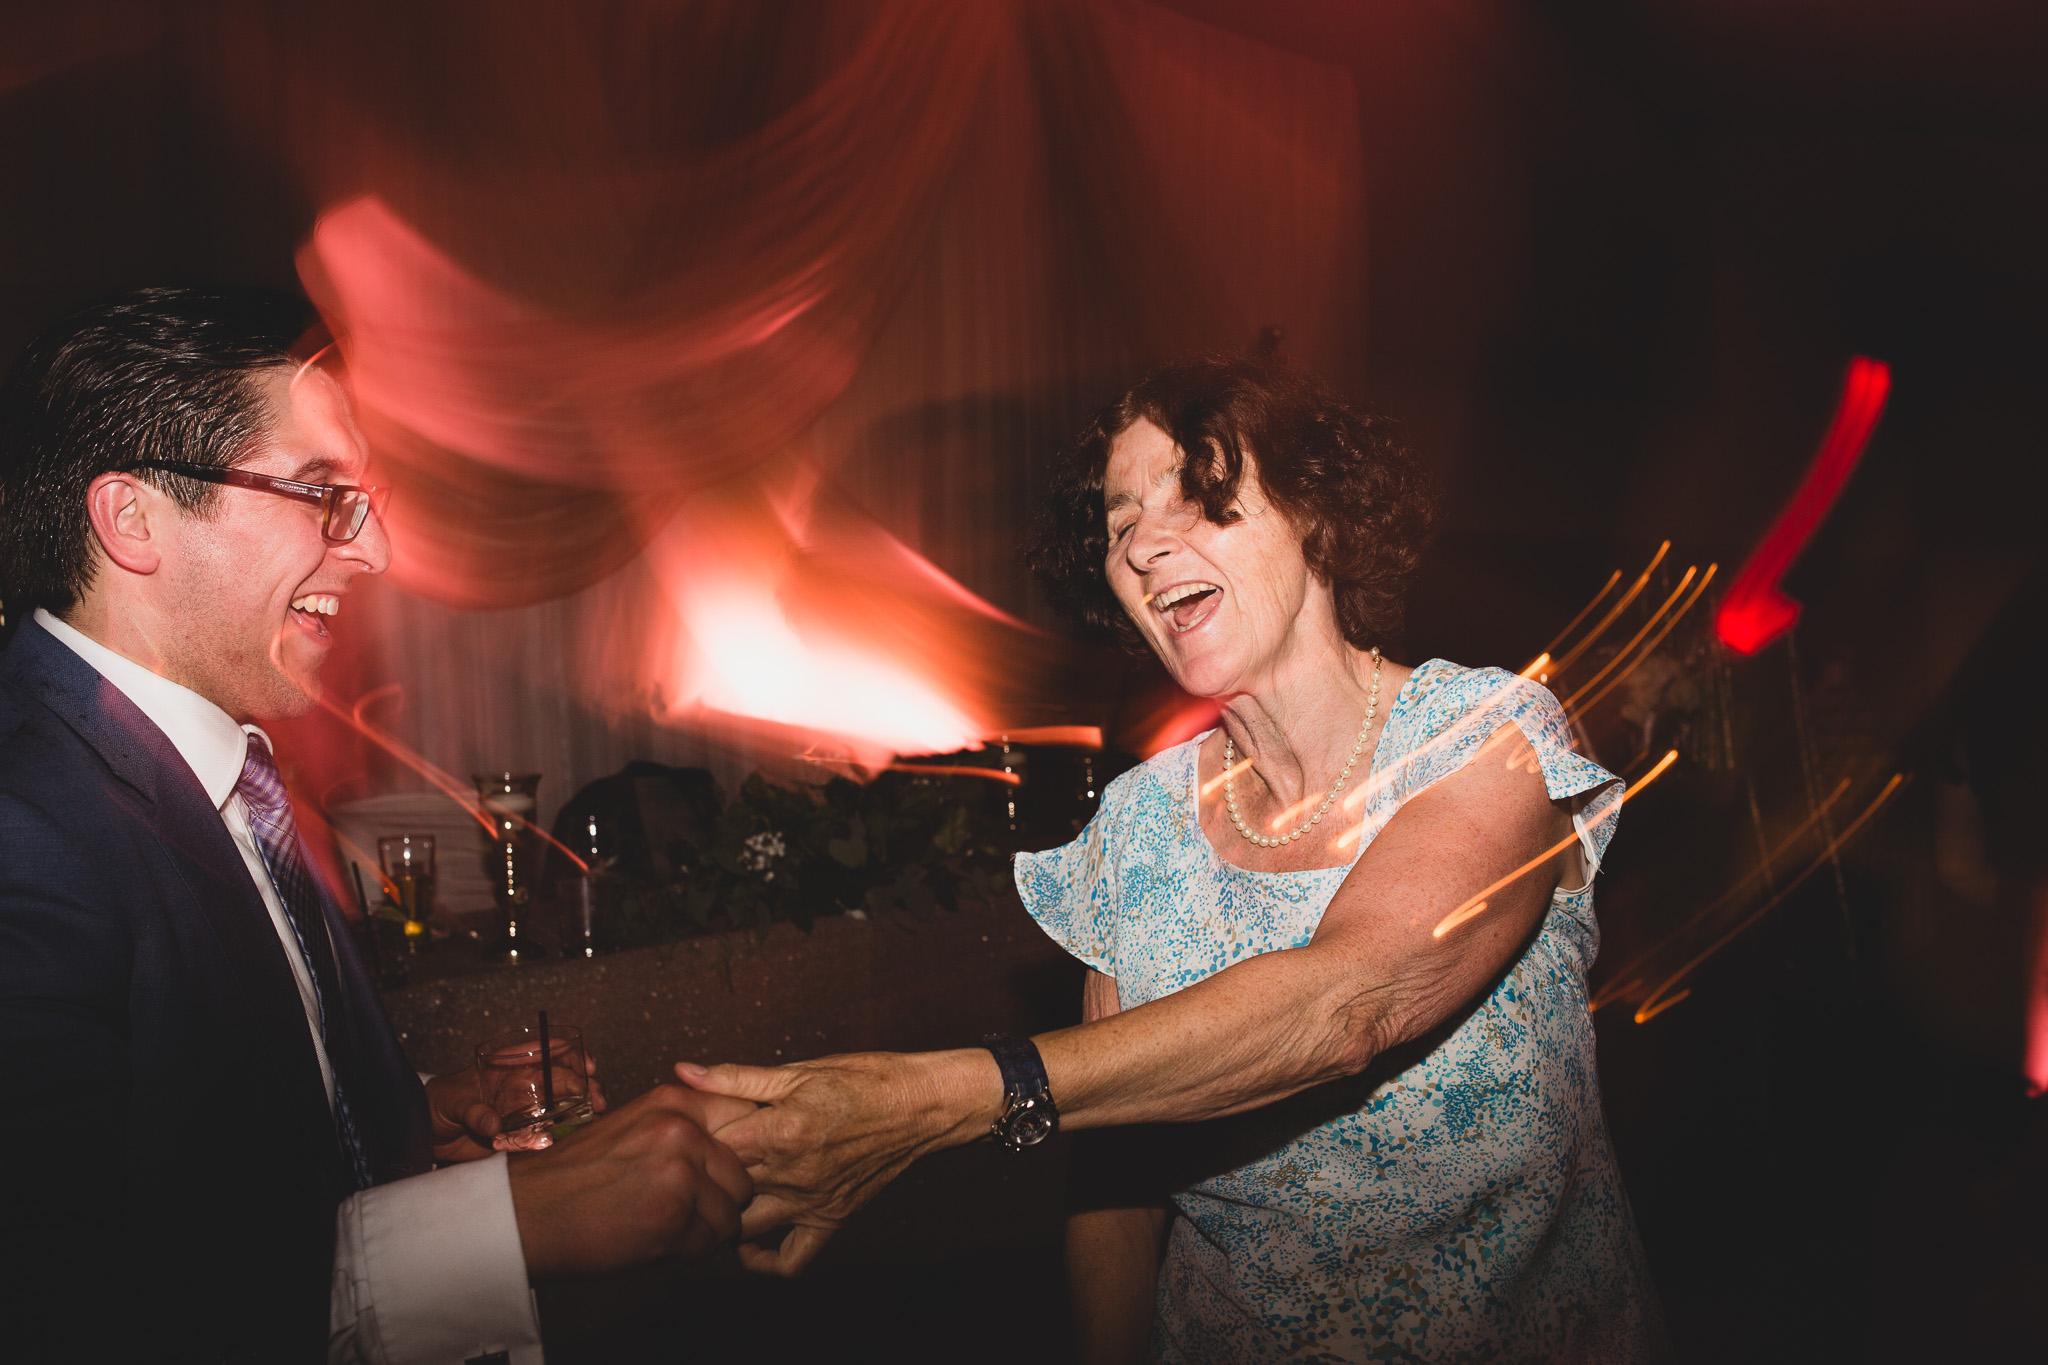 wedding-dance-photos